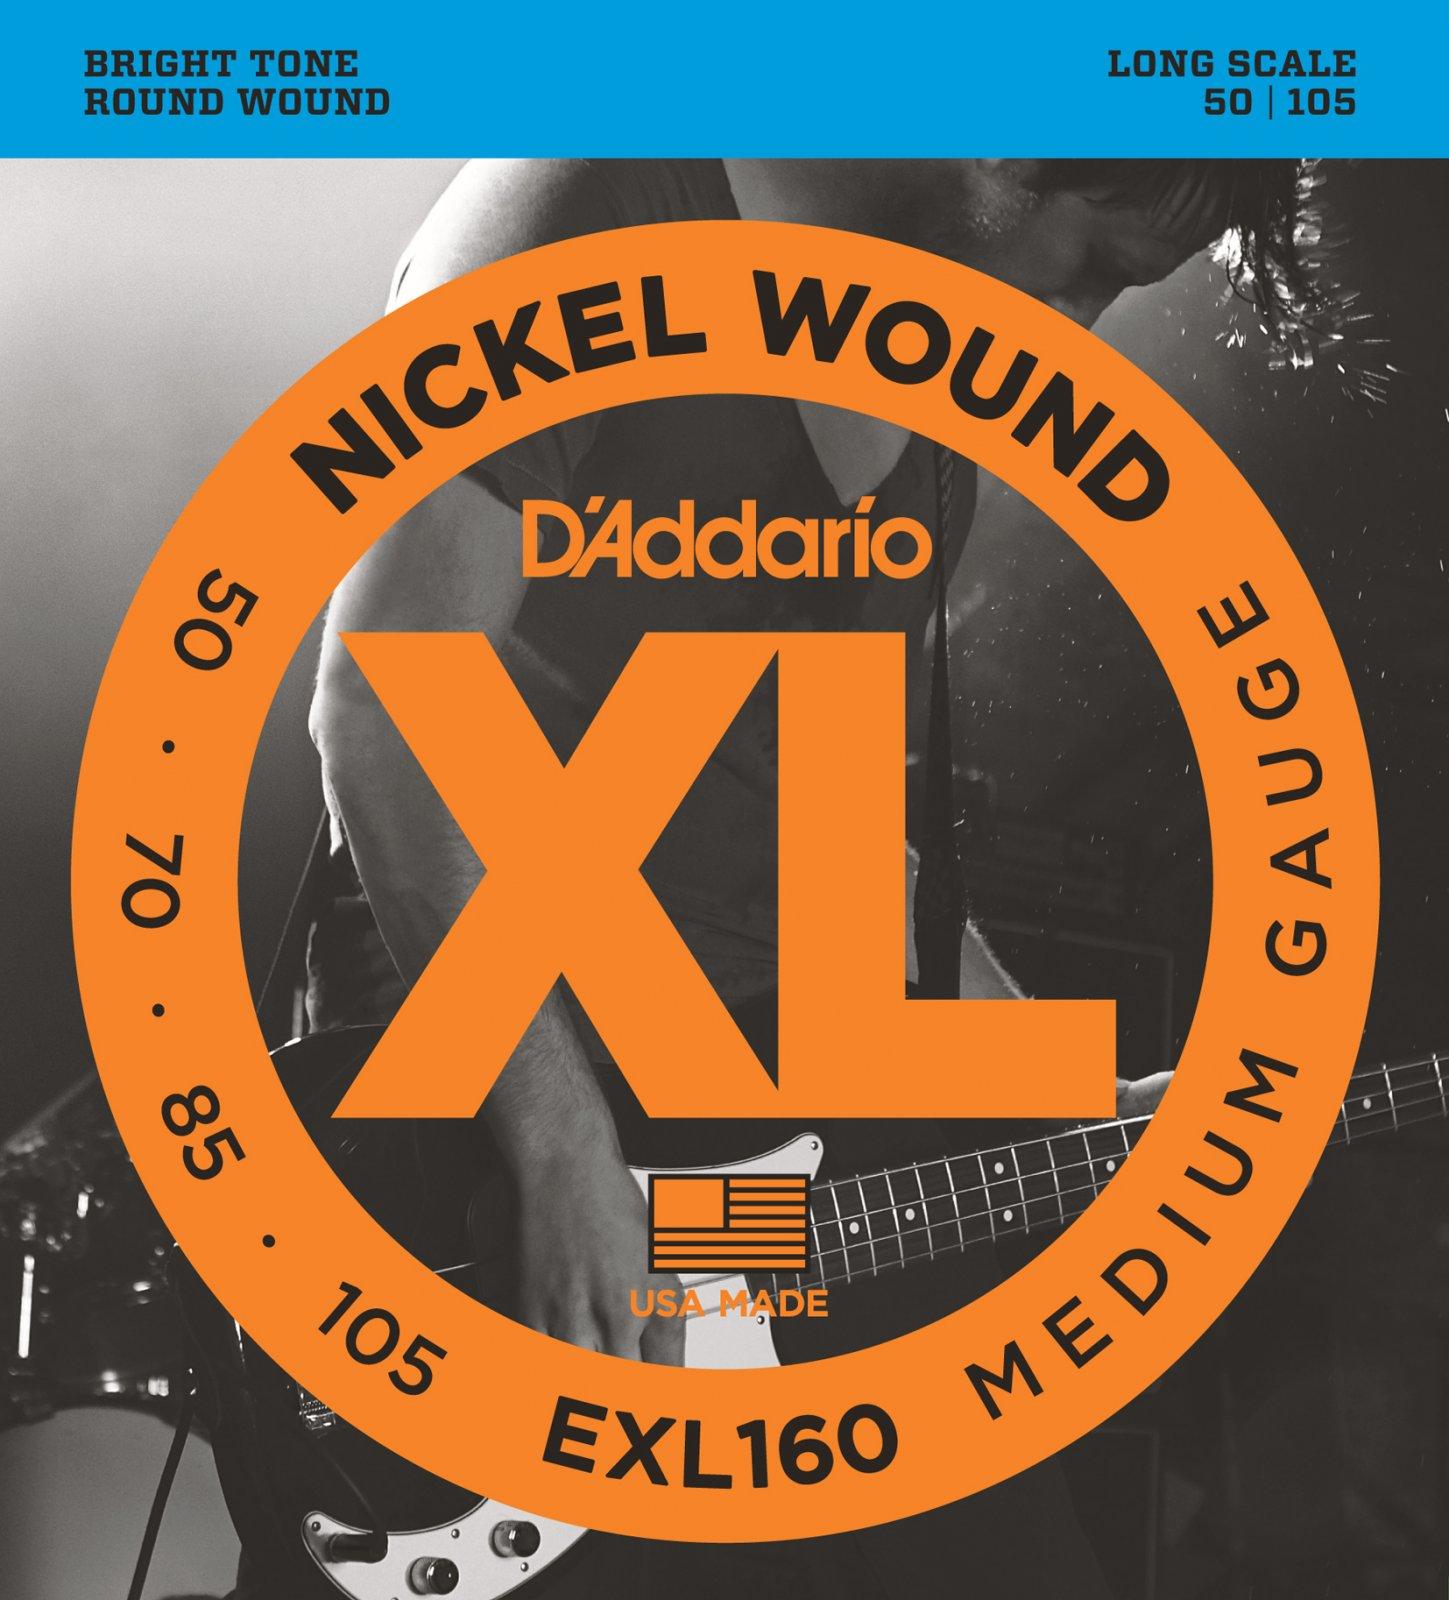 D'Addario EXL160 Nickel Wound Bass Guitar Strings, Medium, 50-105, Long Scale